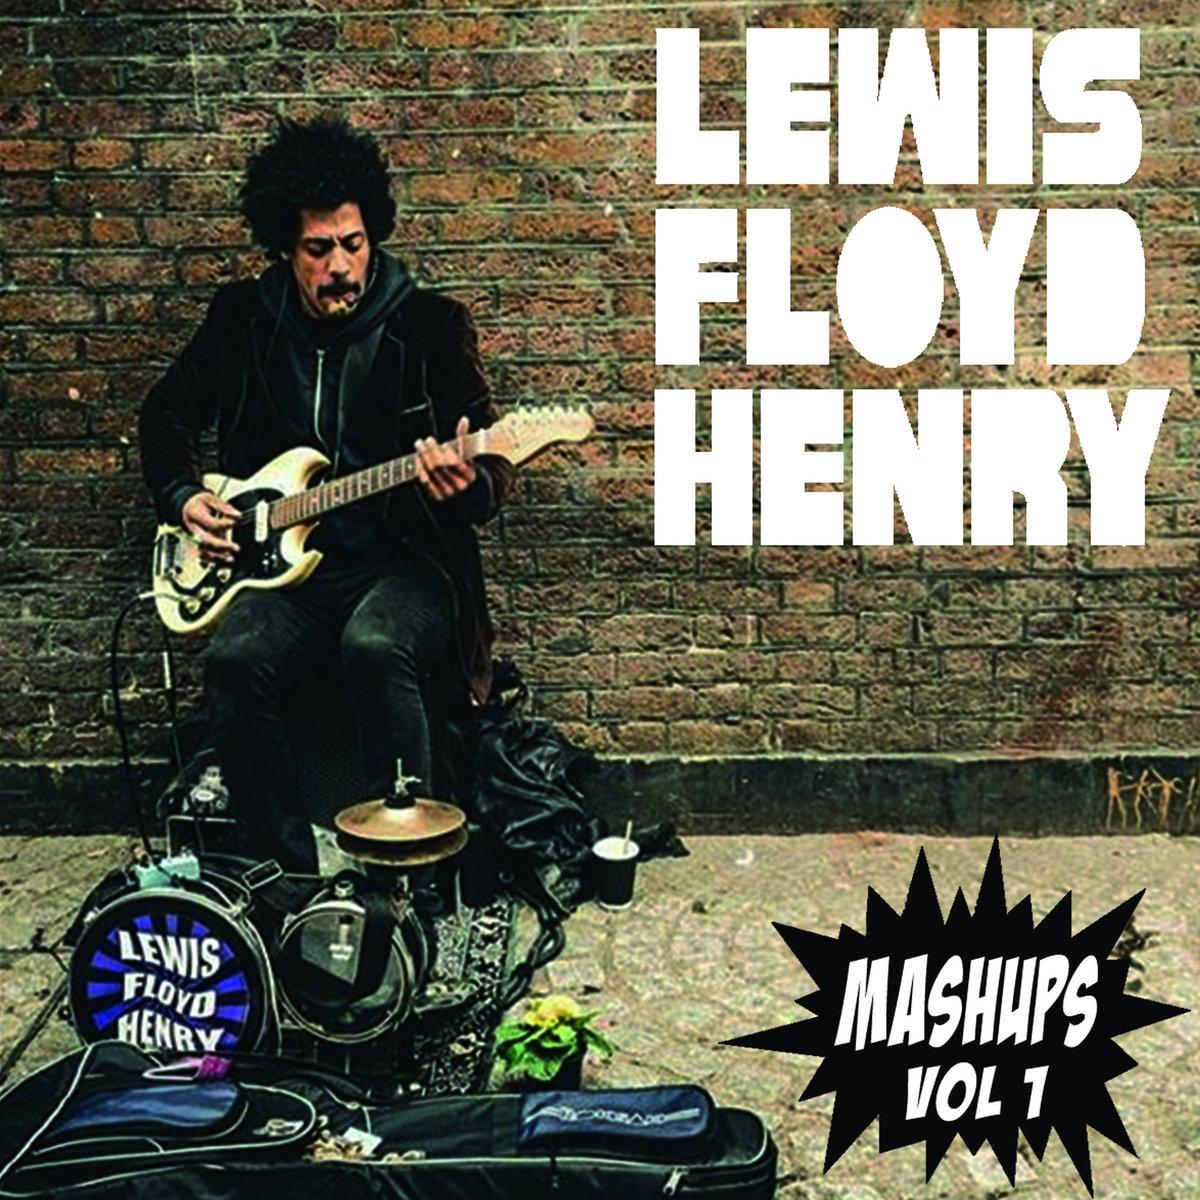 Mashups LP Volume #1 | Lewis Floyd Henry